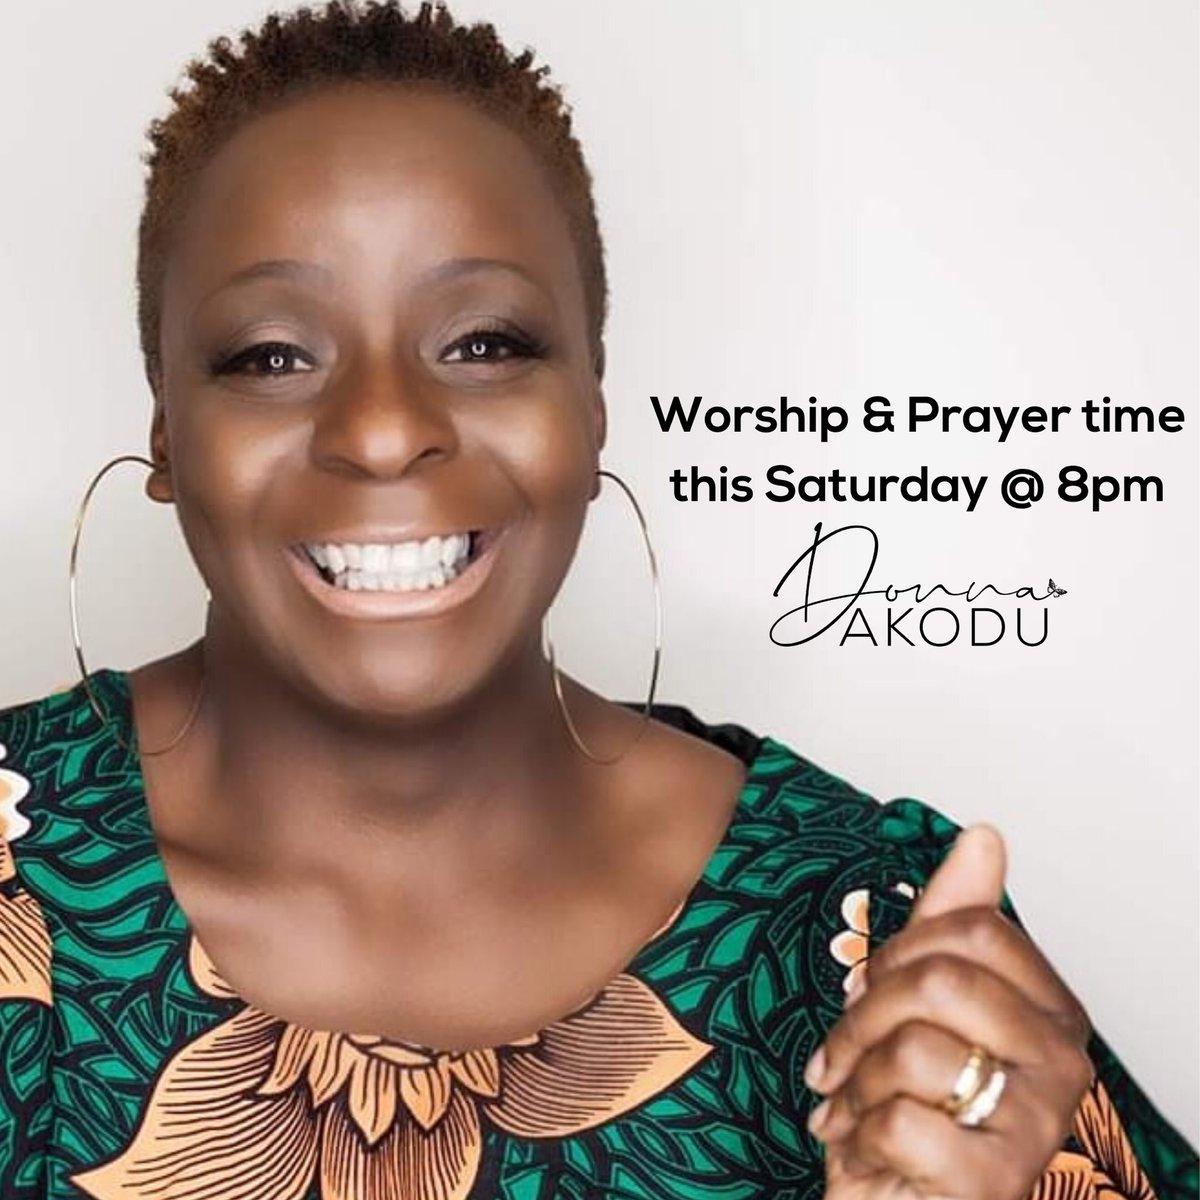 Put this date in your diary calendar tell Alexa & Siri Saturday 11 July @8pm on Facebook #worship #prayerpic.twitter.com/b8Z3WXF1VG